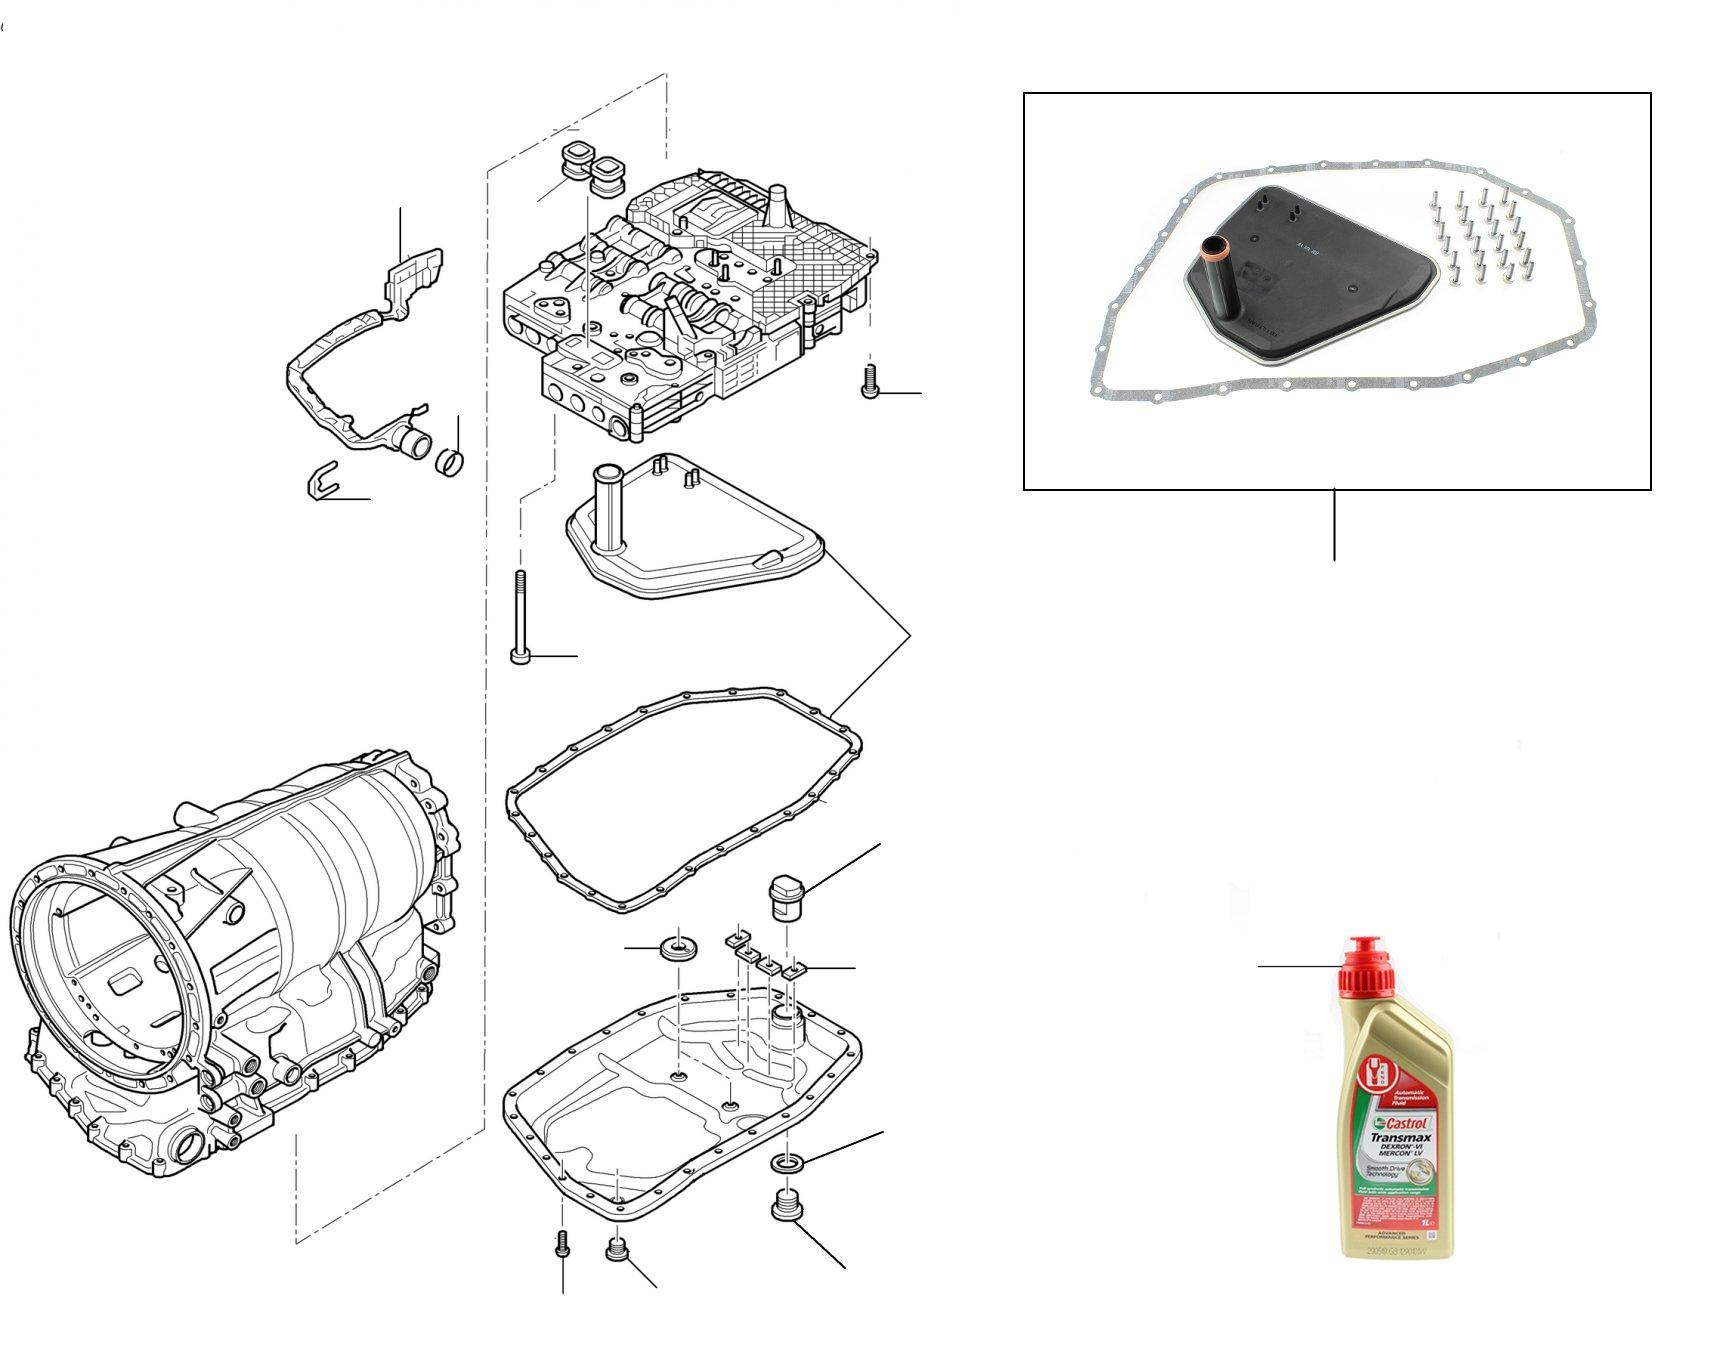 60701 Gearbox filter kit (24 bolt fixing sump) 09E325429-KT24-BR - 2004-2007 (24 bolt fixing oil sump)